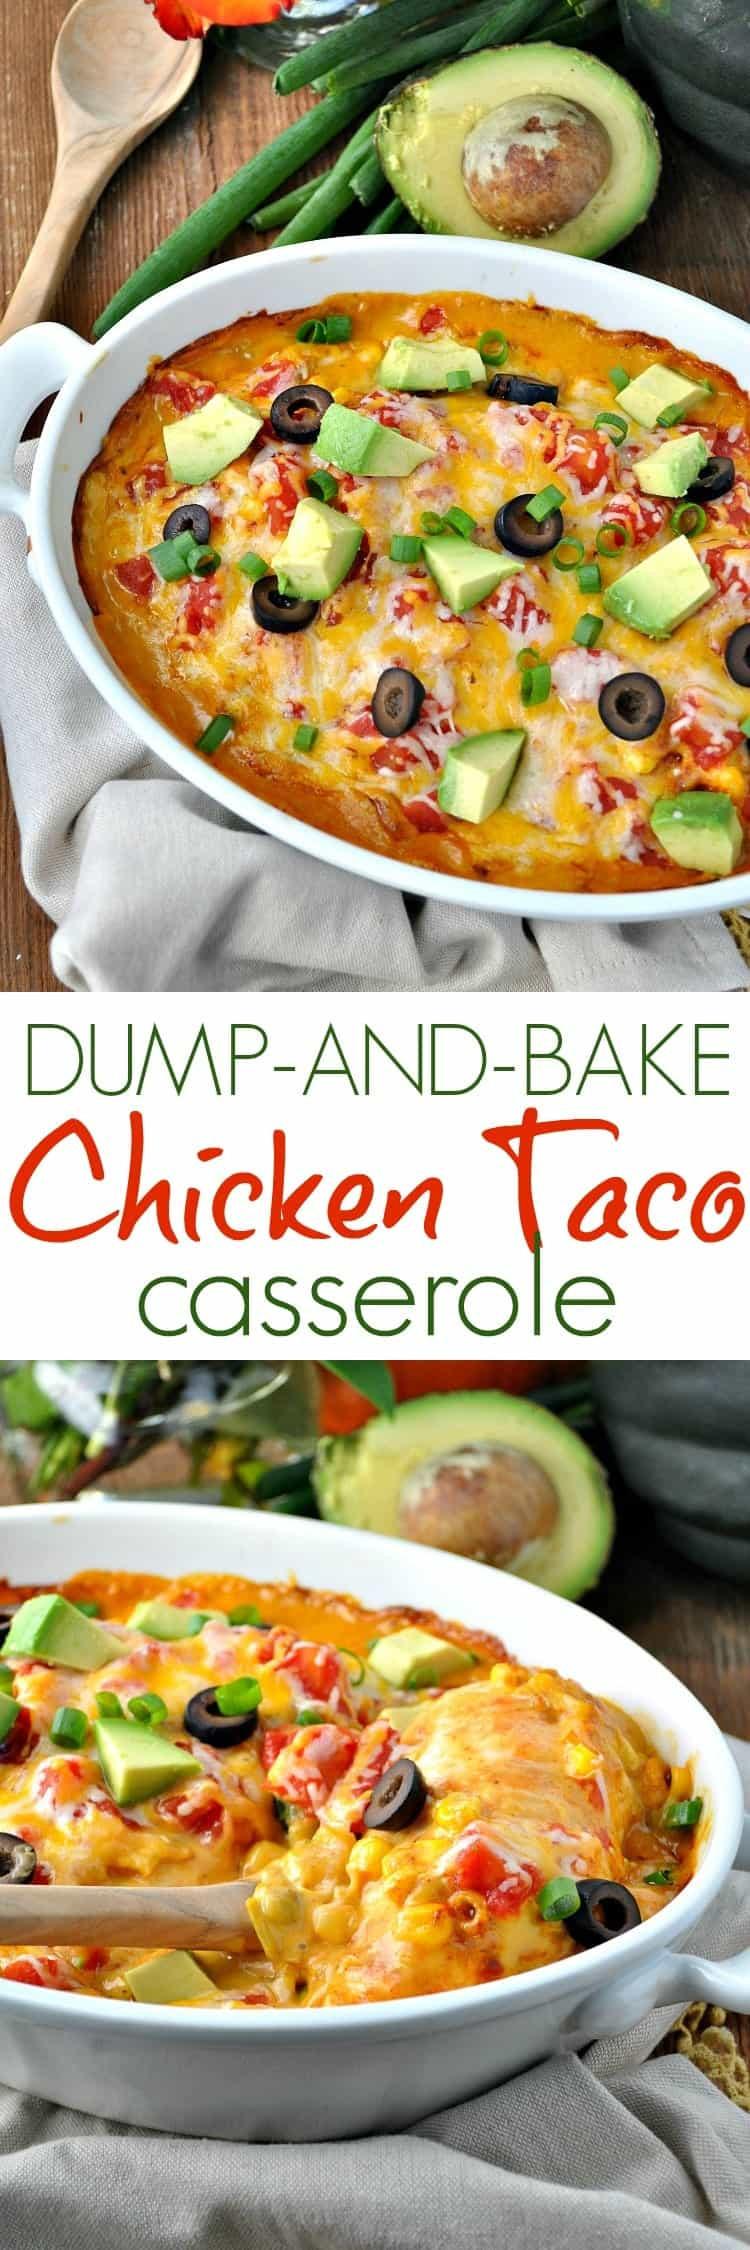 Chicken Taco Casserole  Dump and Bake Chicken Taco Casserole The Seasoned Mom